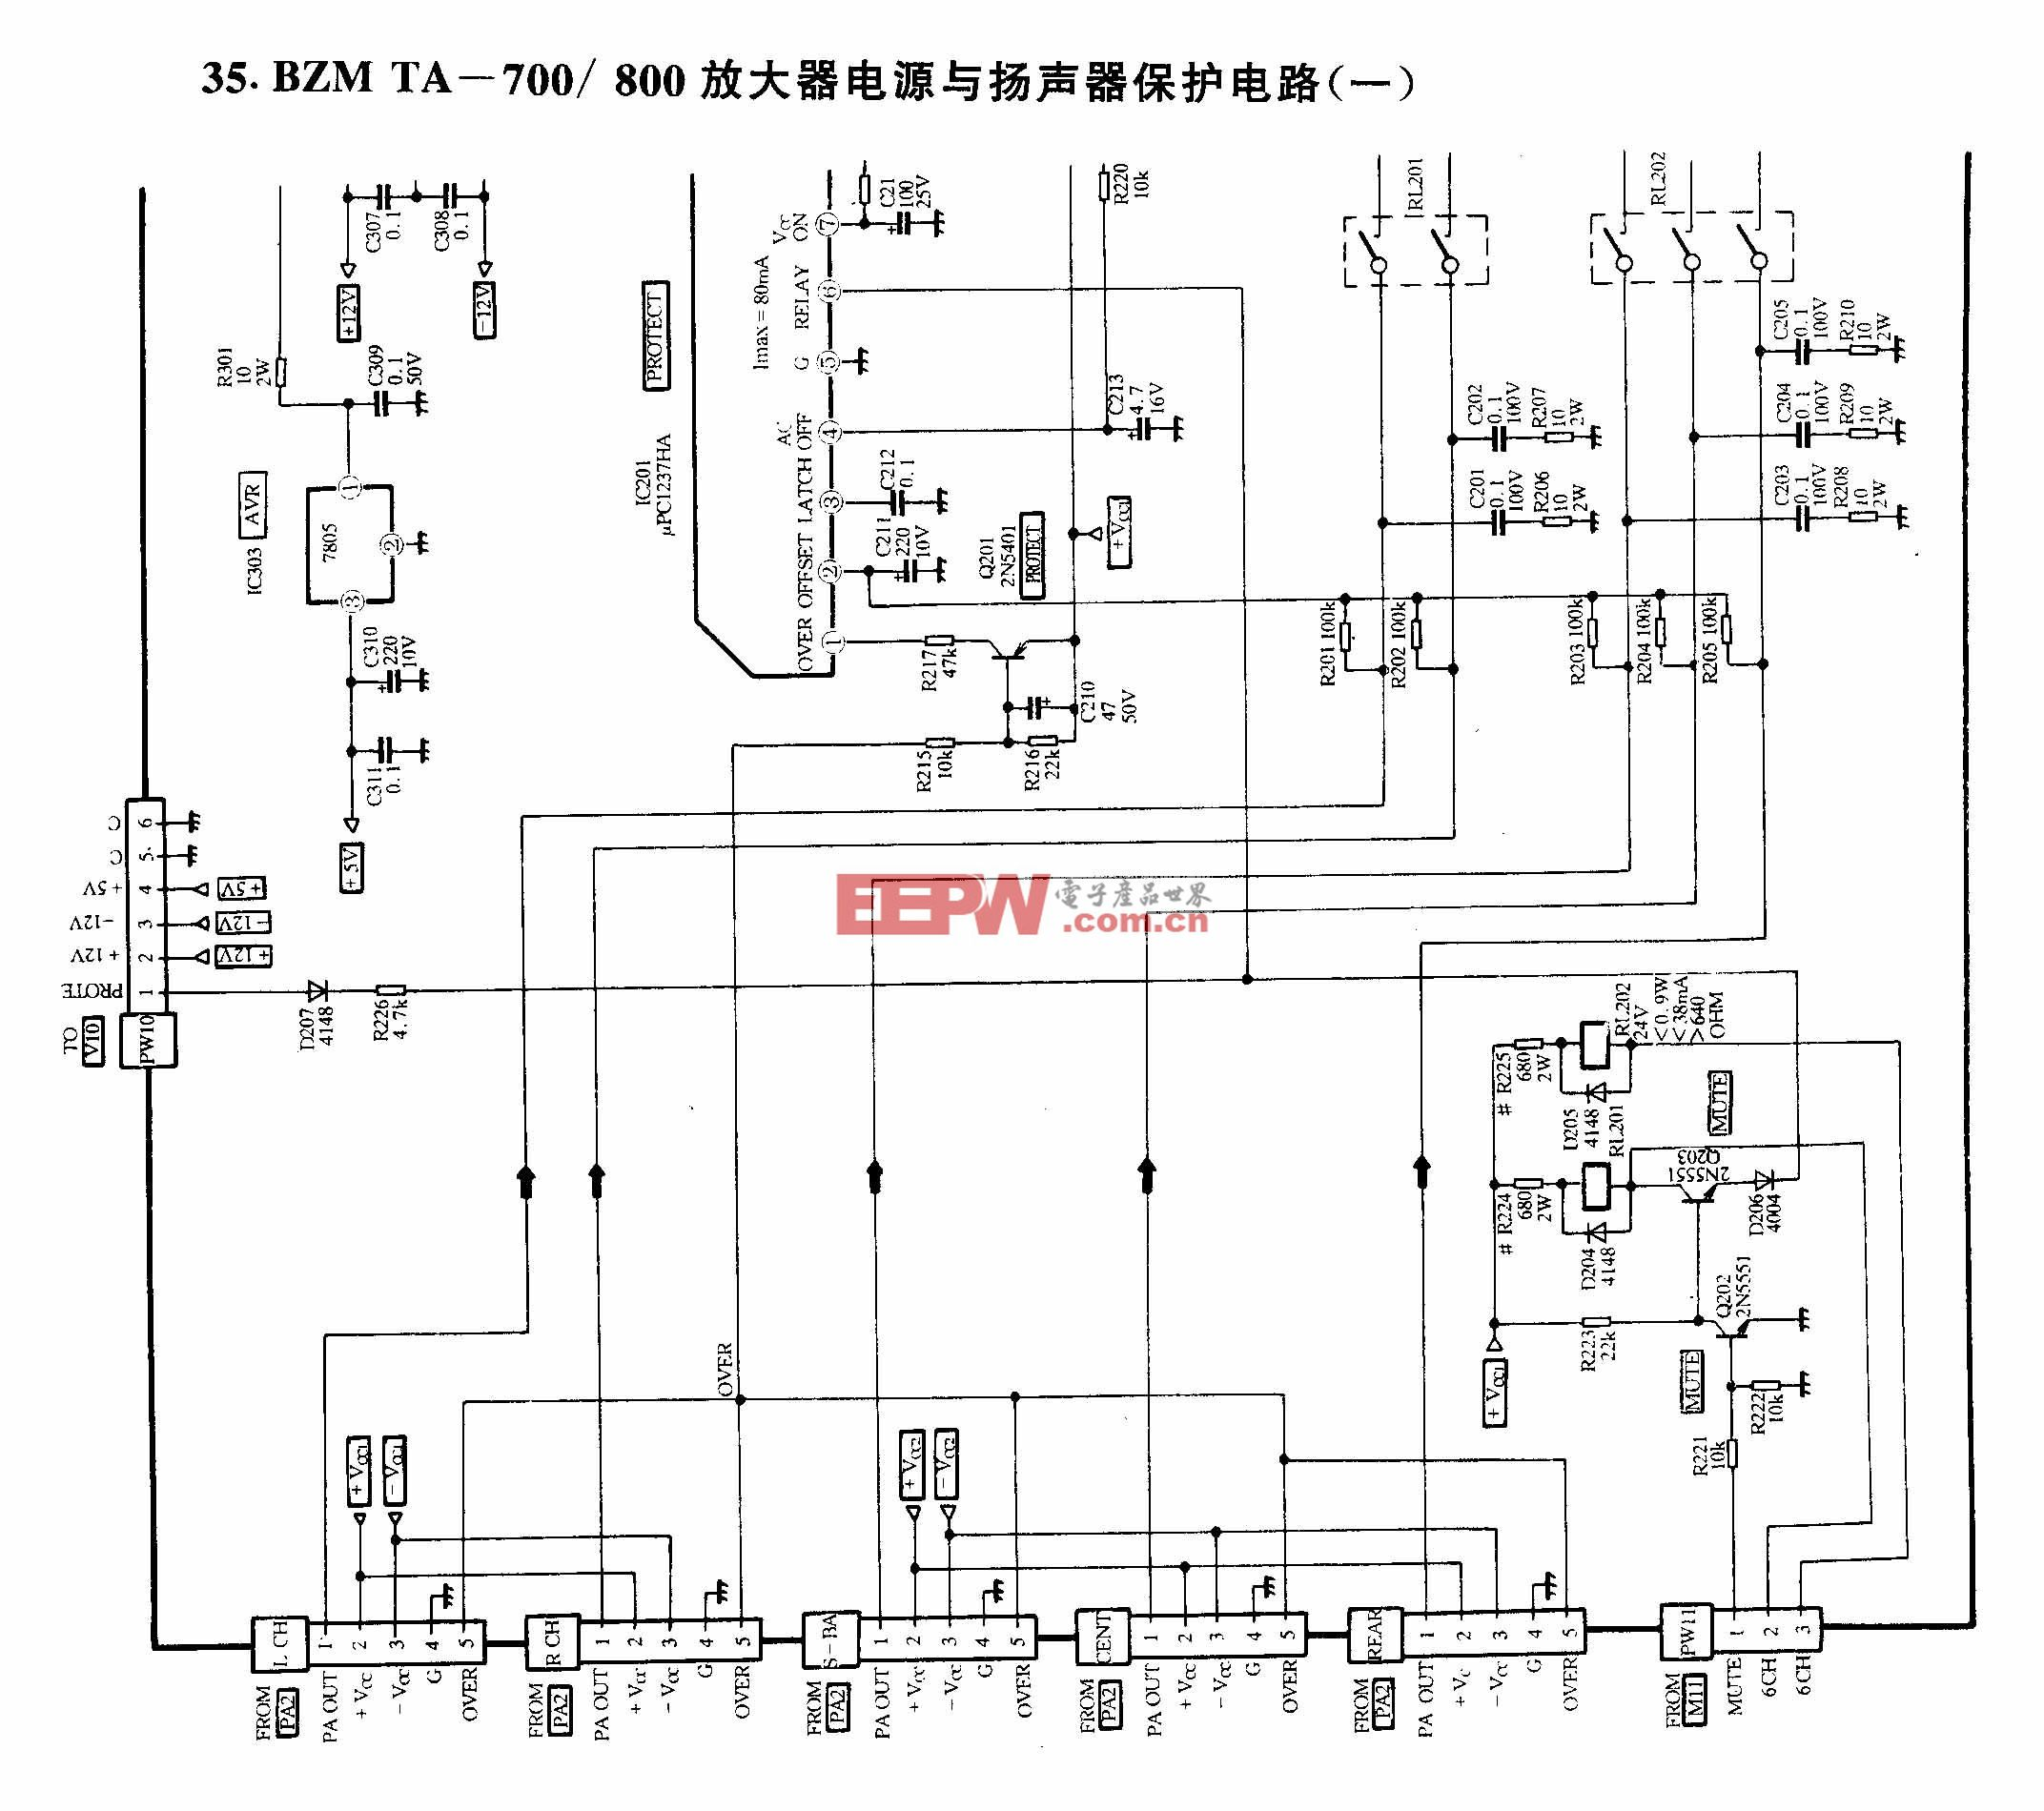 BZMTA-700/800放大器电源与扬声器保护电路(一)